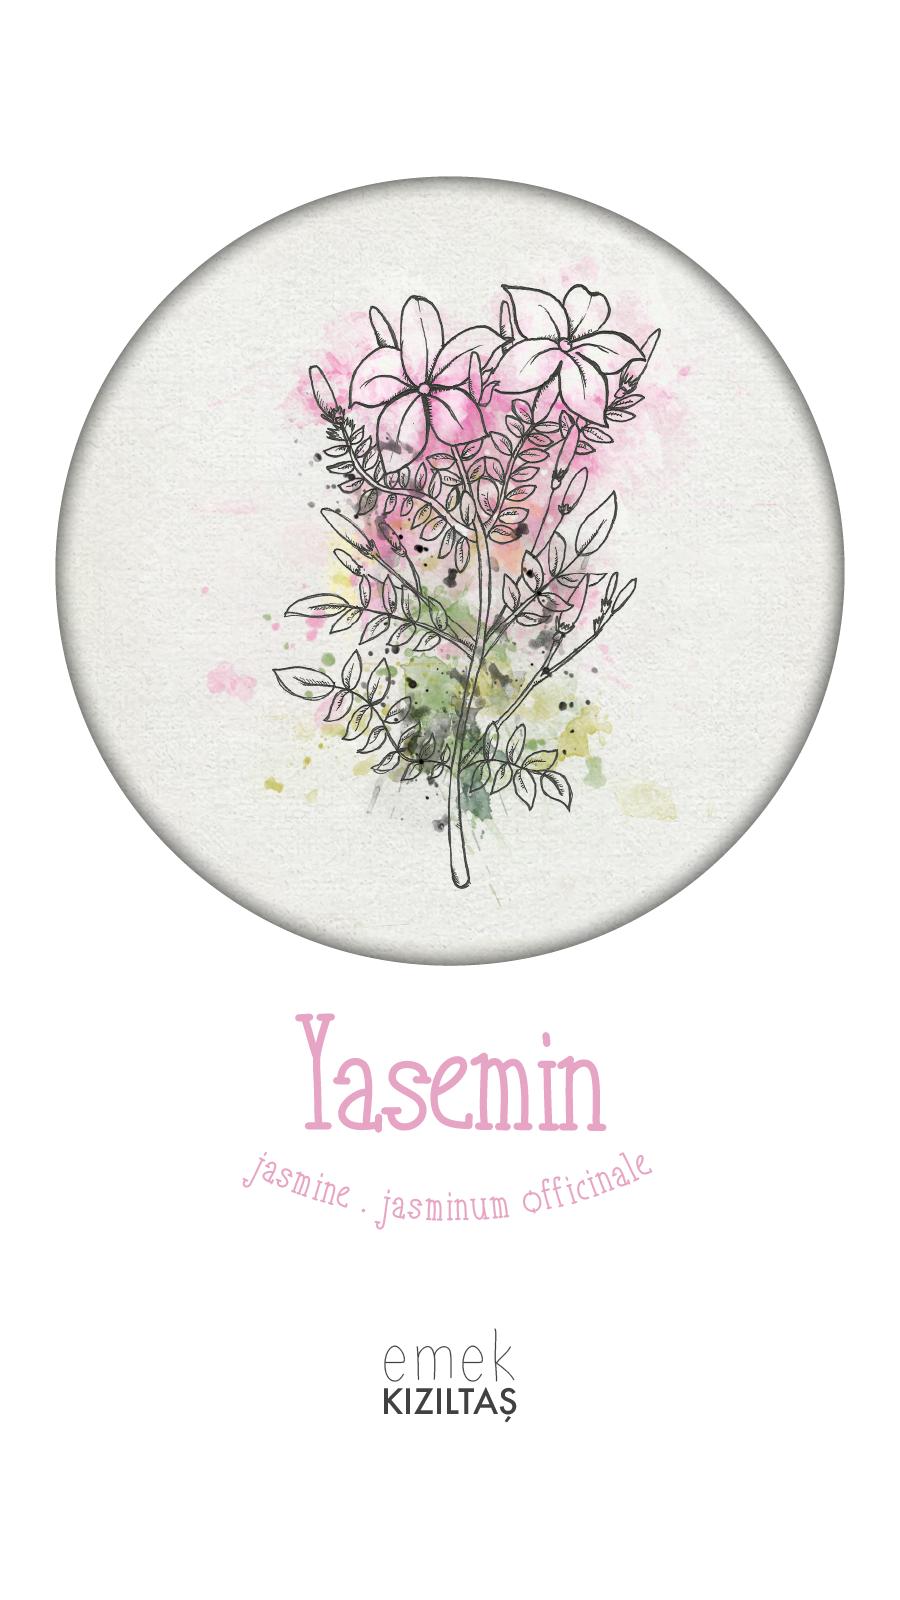 Cosmopolitan Turkey November 2018 Symbols Jasmine By Emekkiziltas Illustrations Editorialillustration Illustration Symbols Cosmopolit Jasmine Instagram